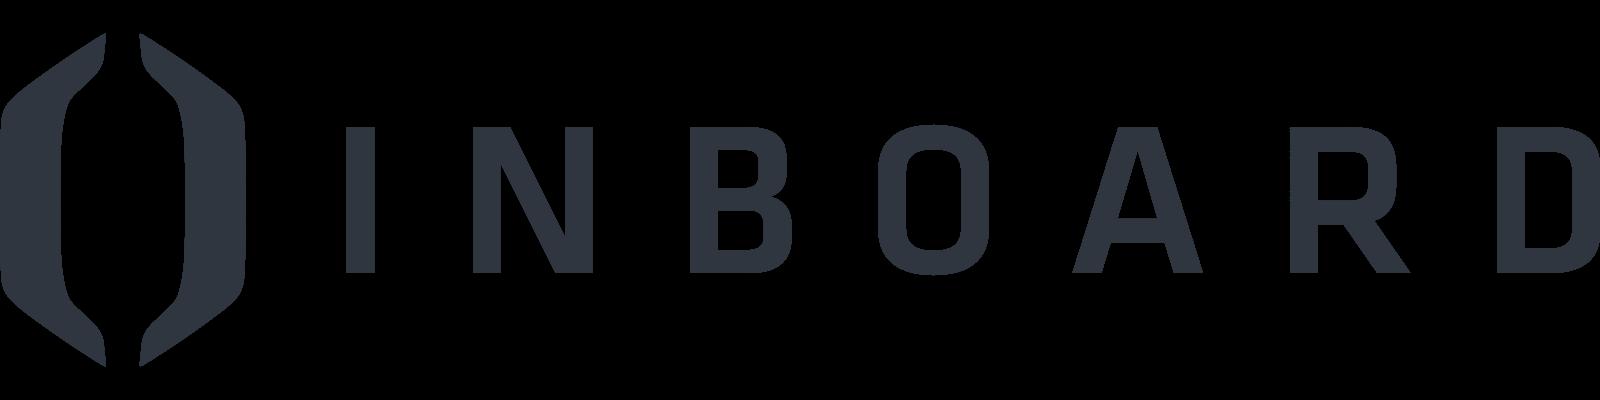 Inboard-logo-dark.png